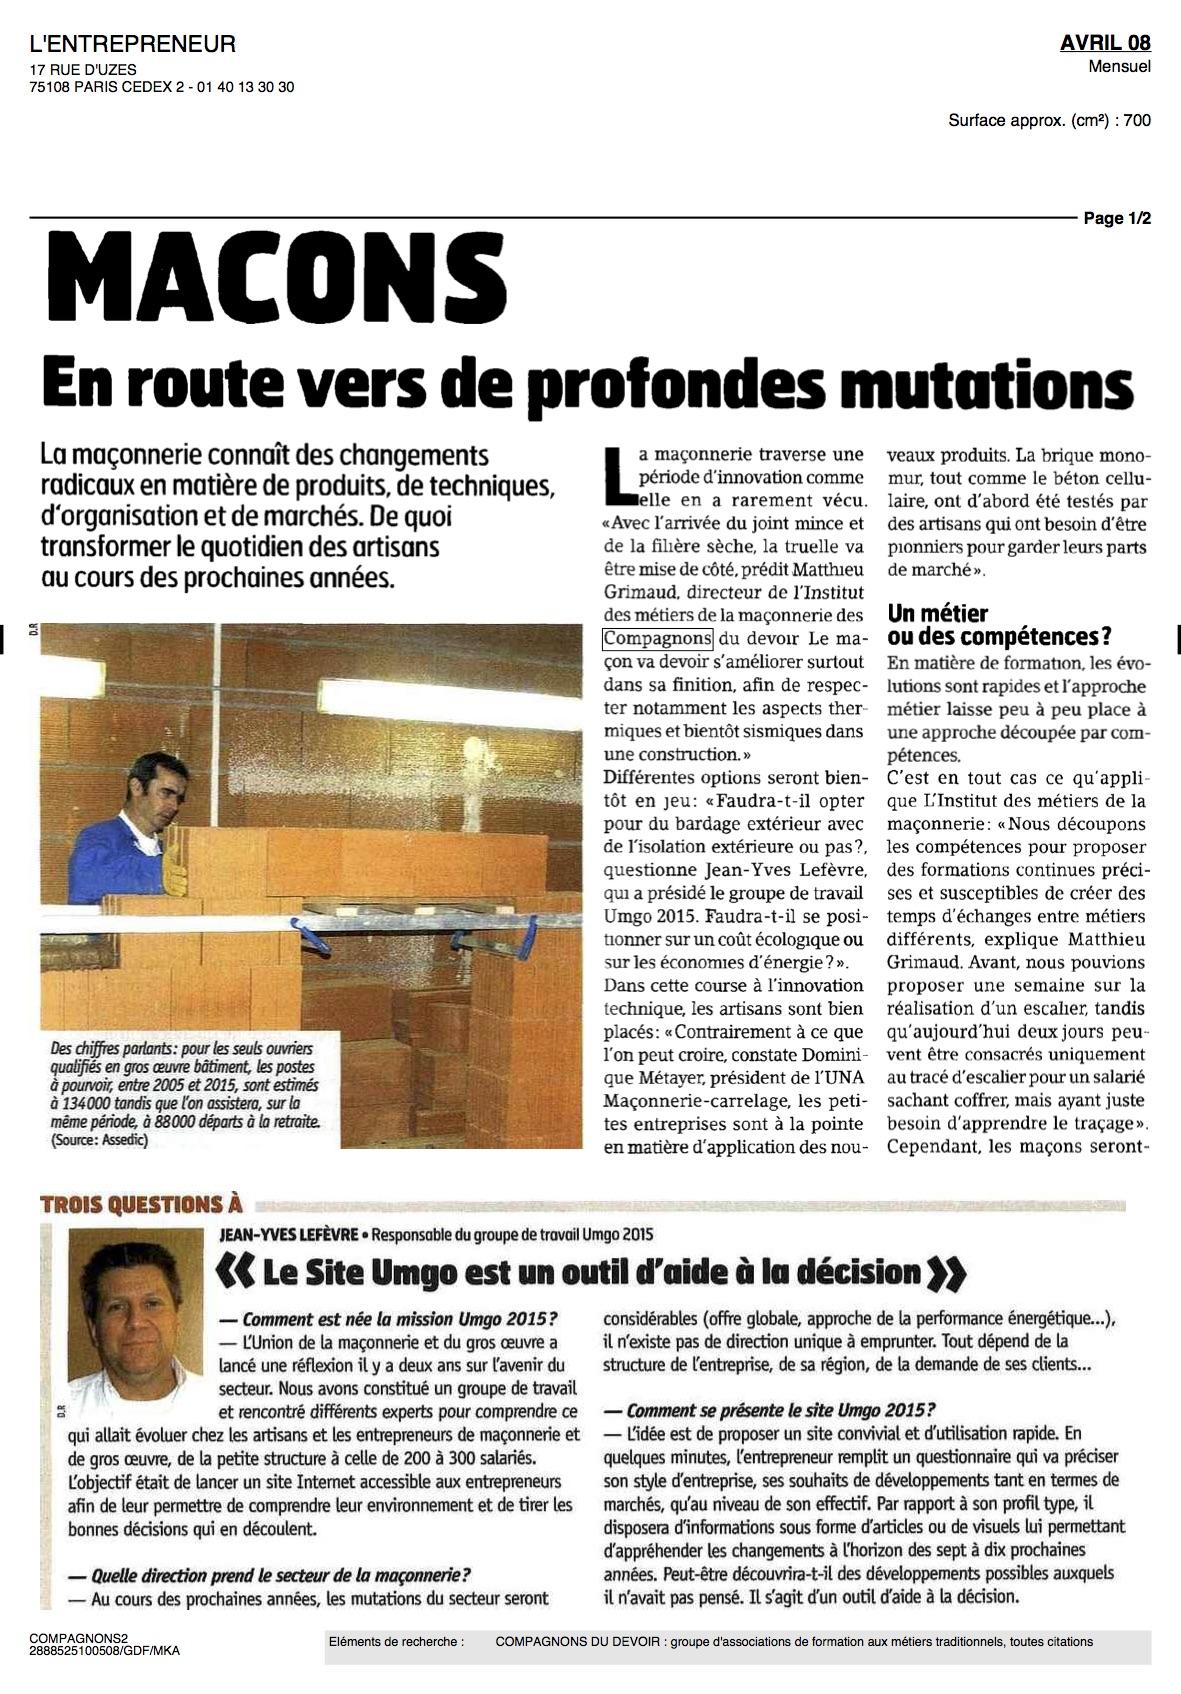 2008-04-10~Magazine l'ENTREPRENEUR